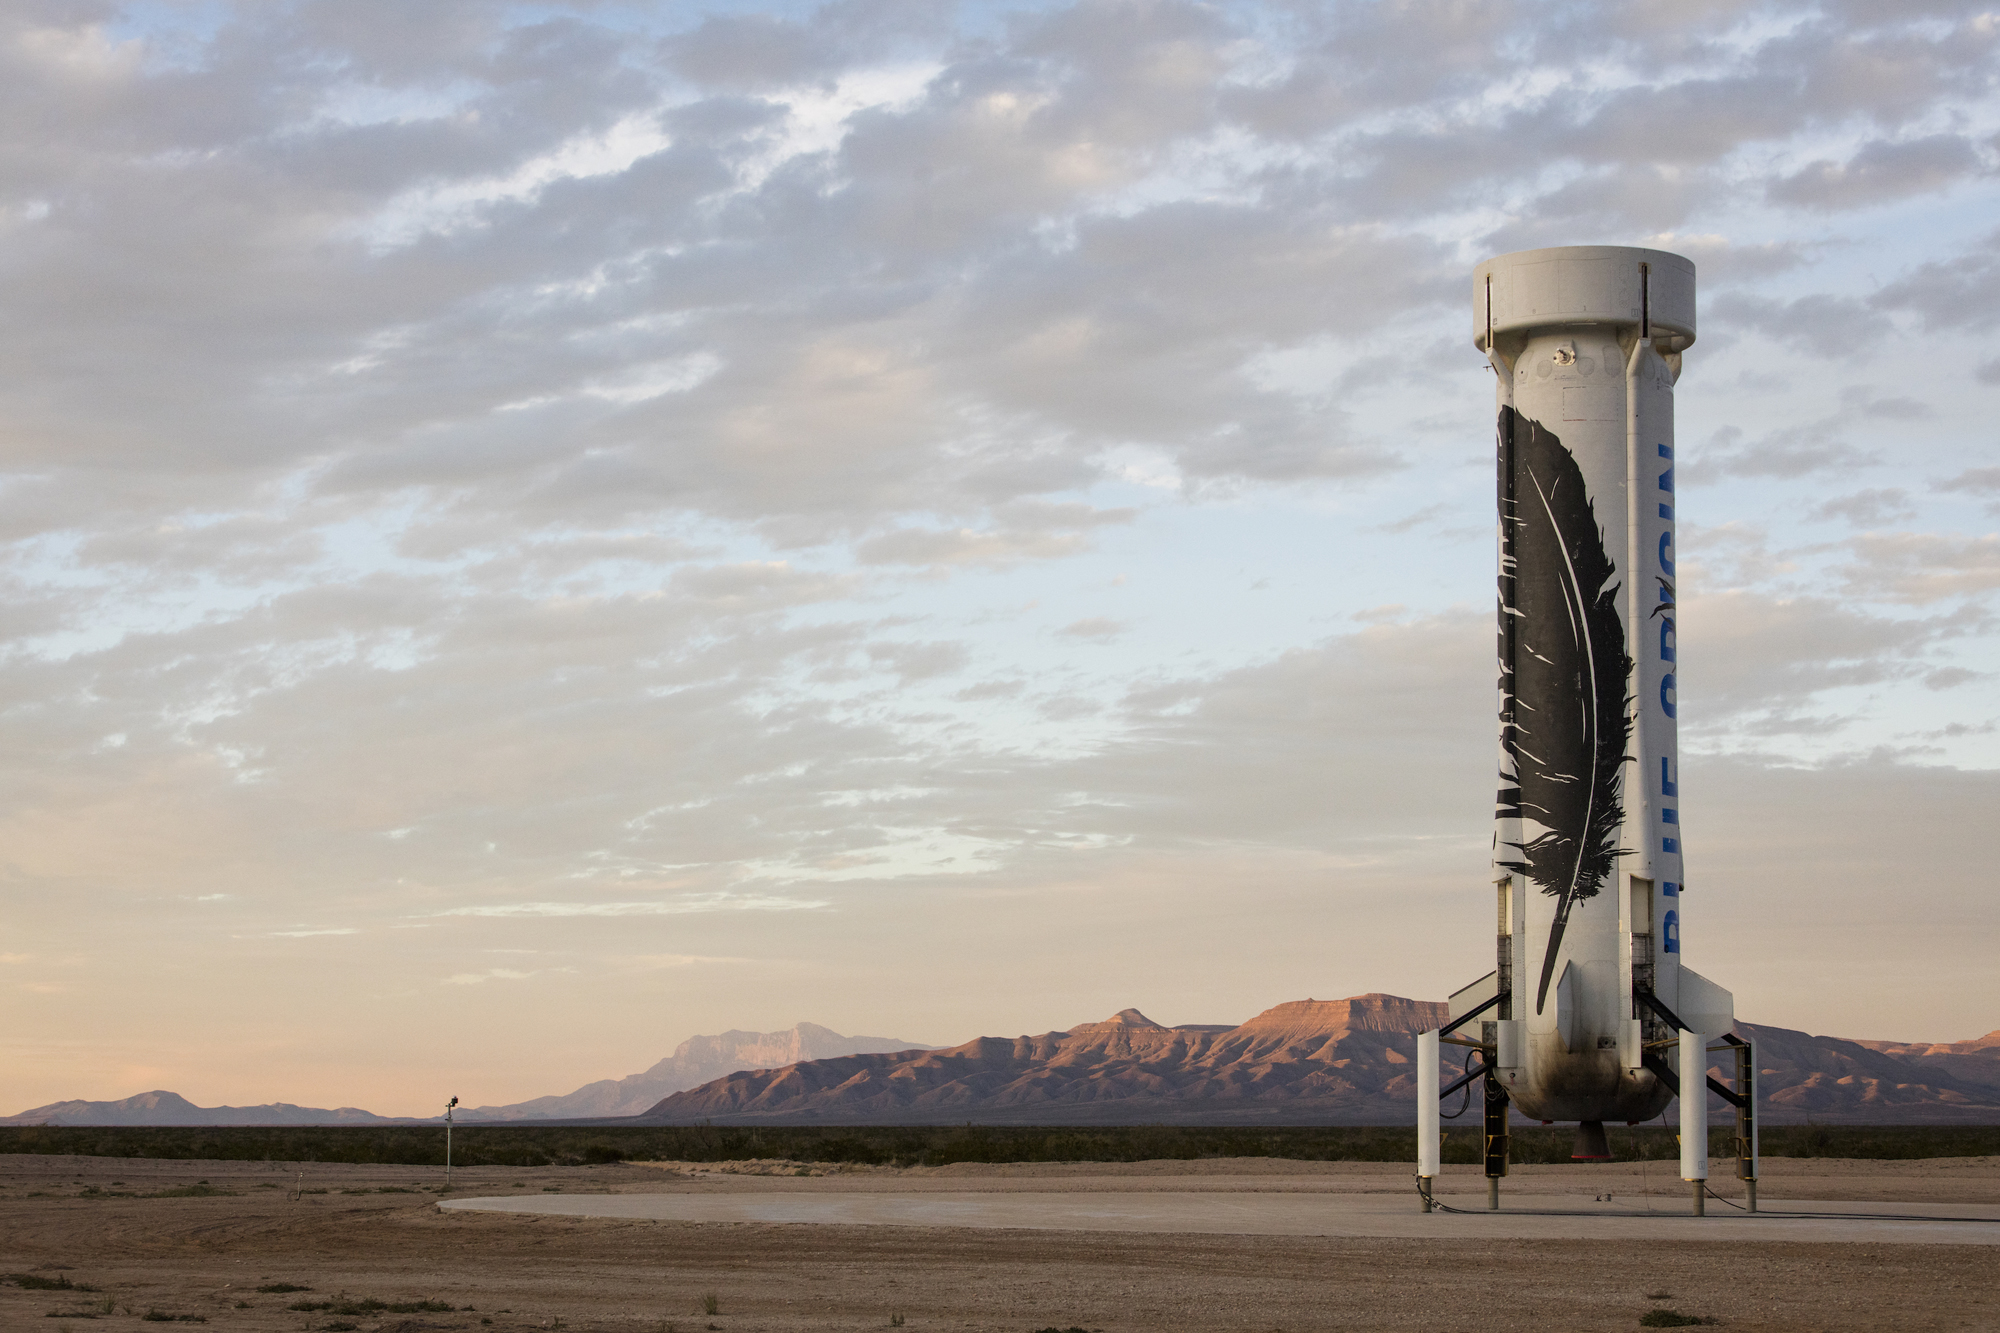 Blue Origin's New Shepard Rocket After Landing